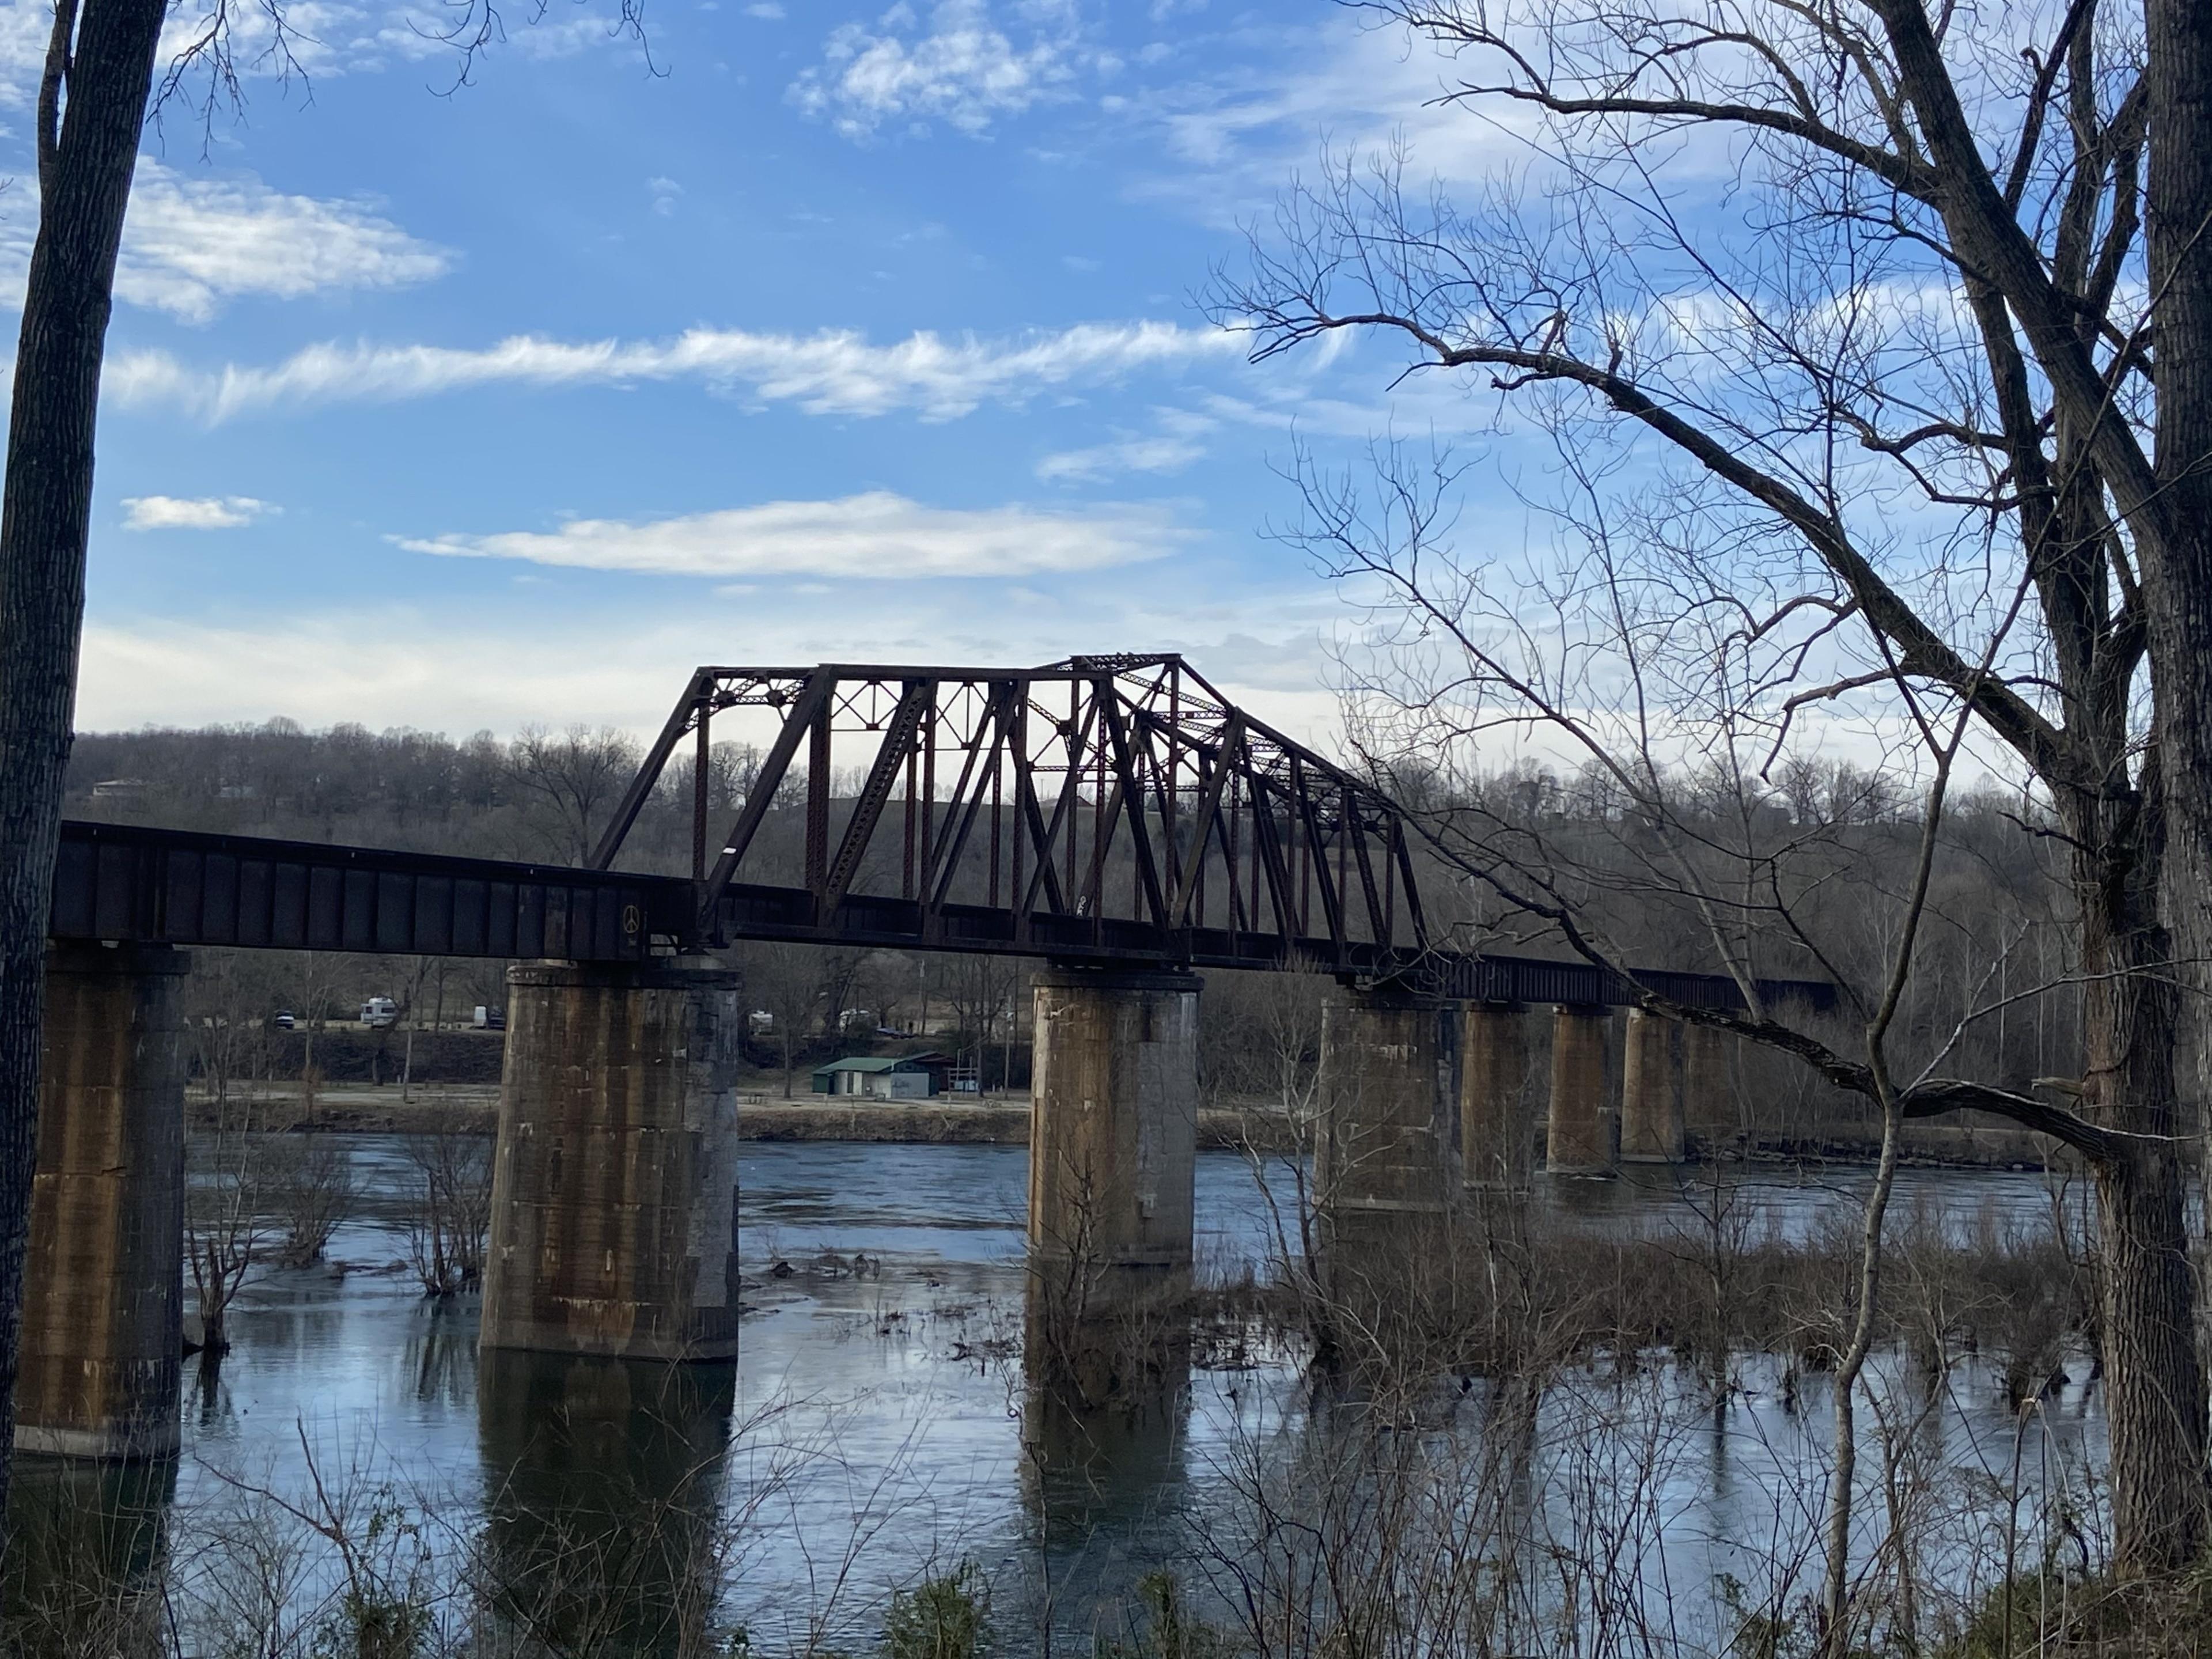 Hrabstwo Baxter, Arkansas, Stany Zjednoczone